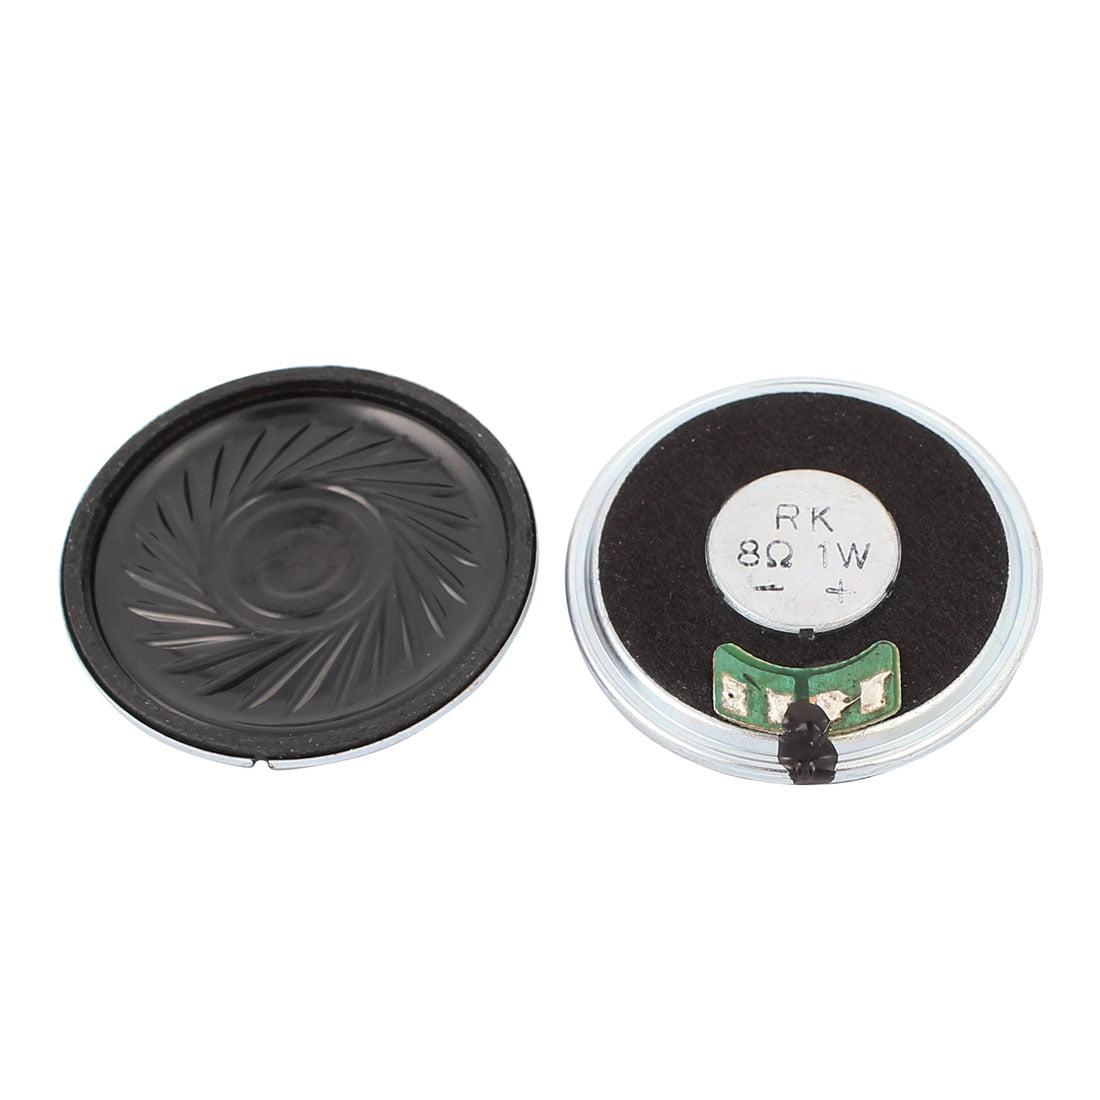 5Pcs 40mm Dia 8 Ohm 1W Metal Shell Internal Mini Speakers Magnetic Loudspeaker - image 1 of 2